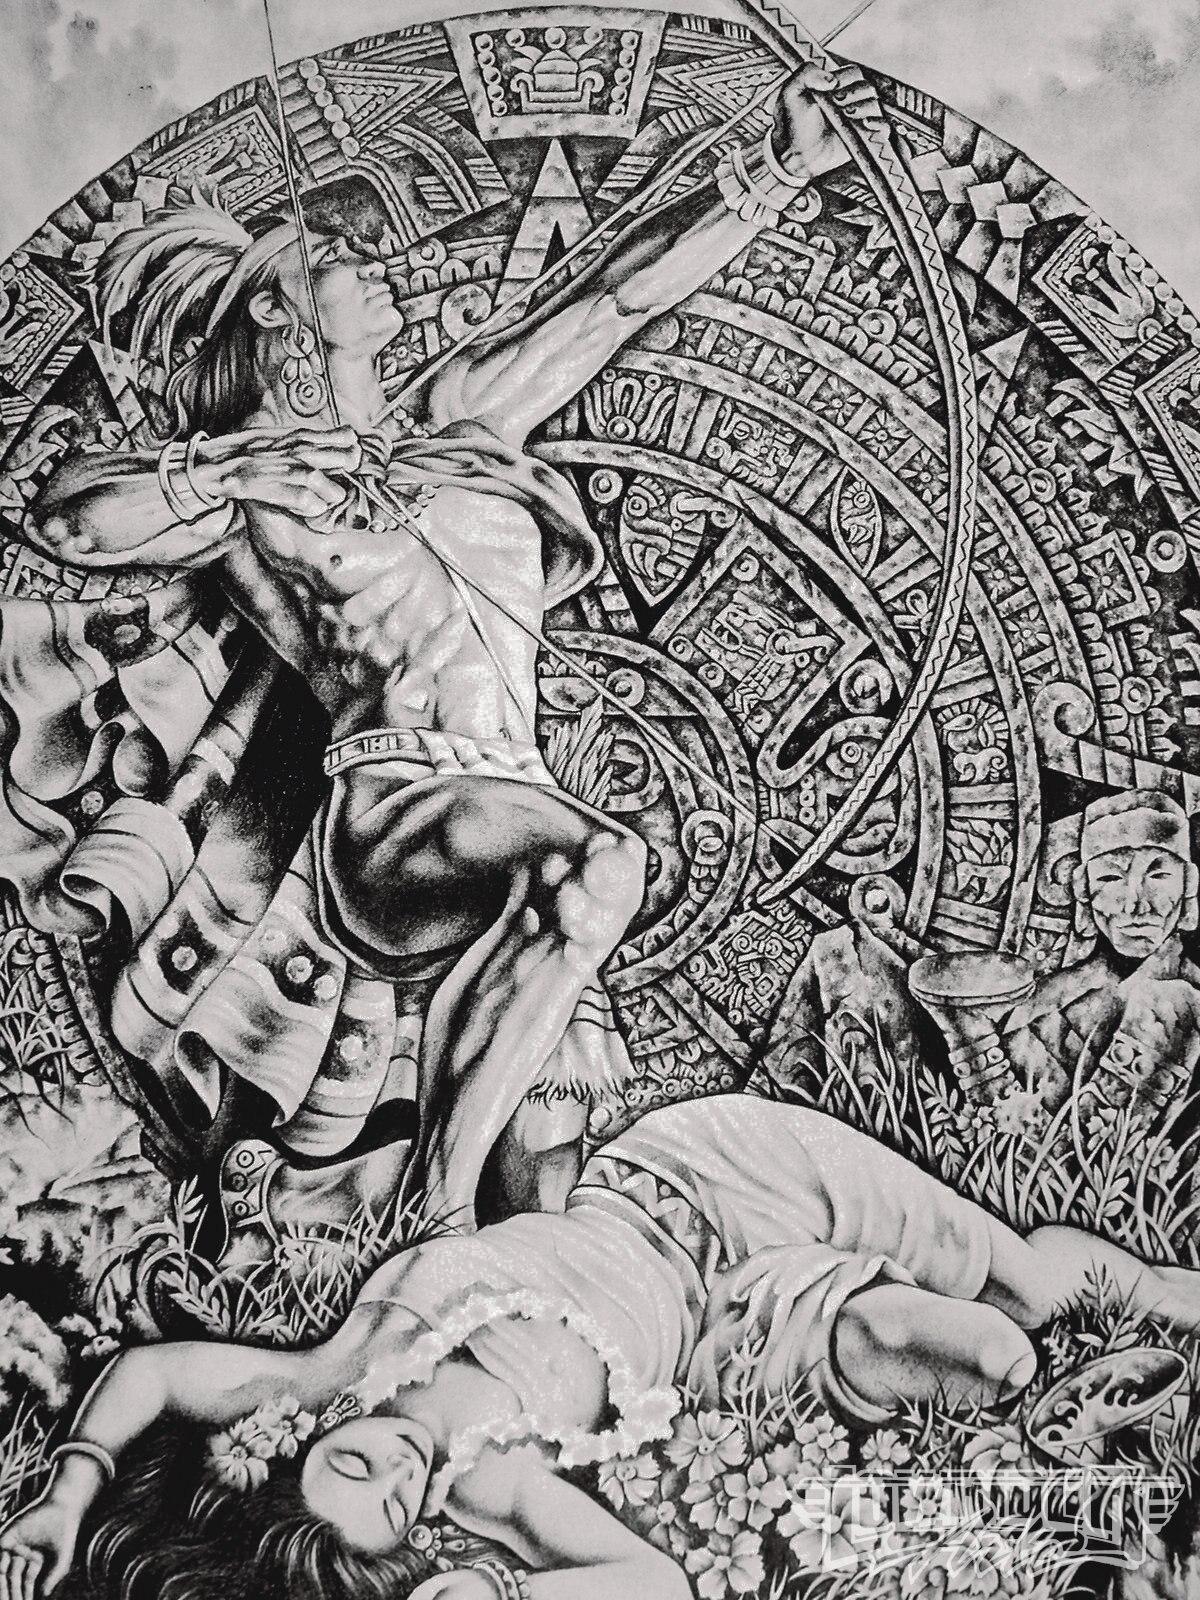 Gangsta Girls And Lowriders Wallpaper Looking Back At 20 Years Of Lowrider Arte Lowrider Arte